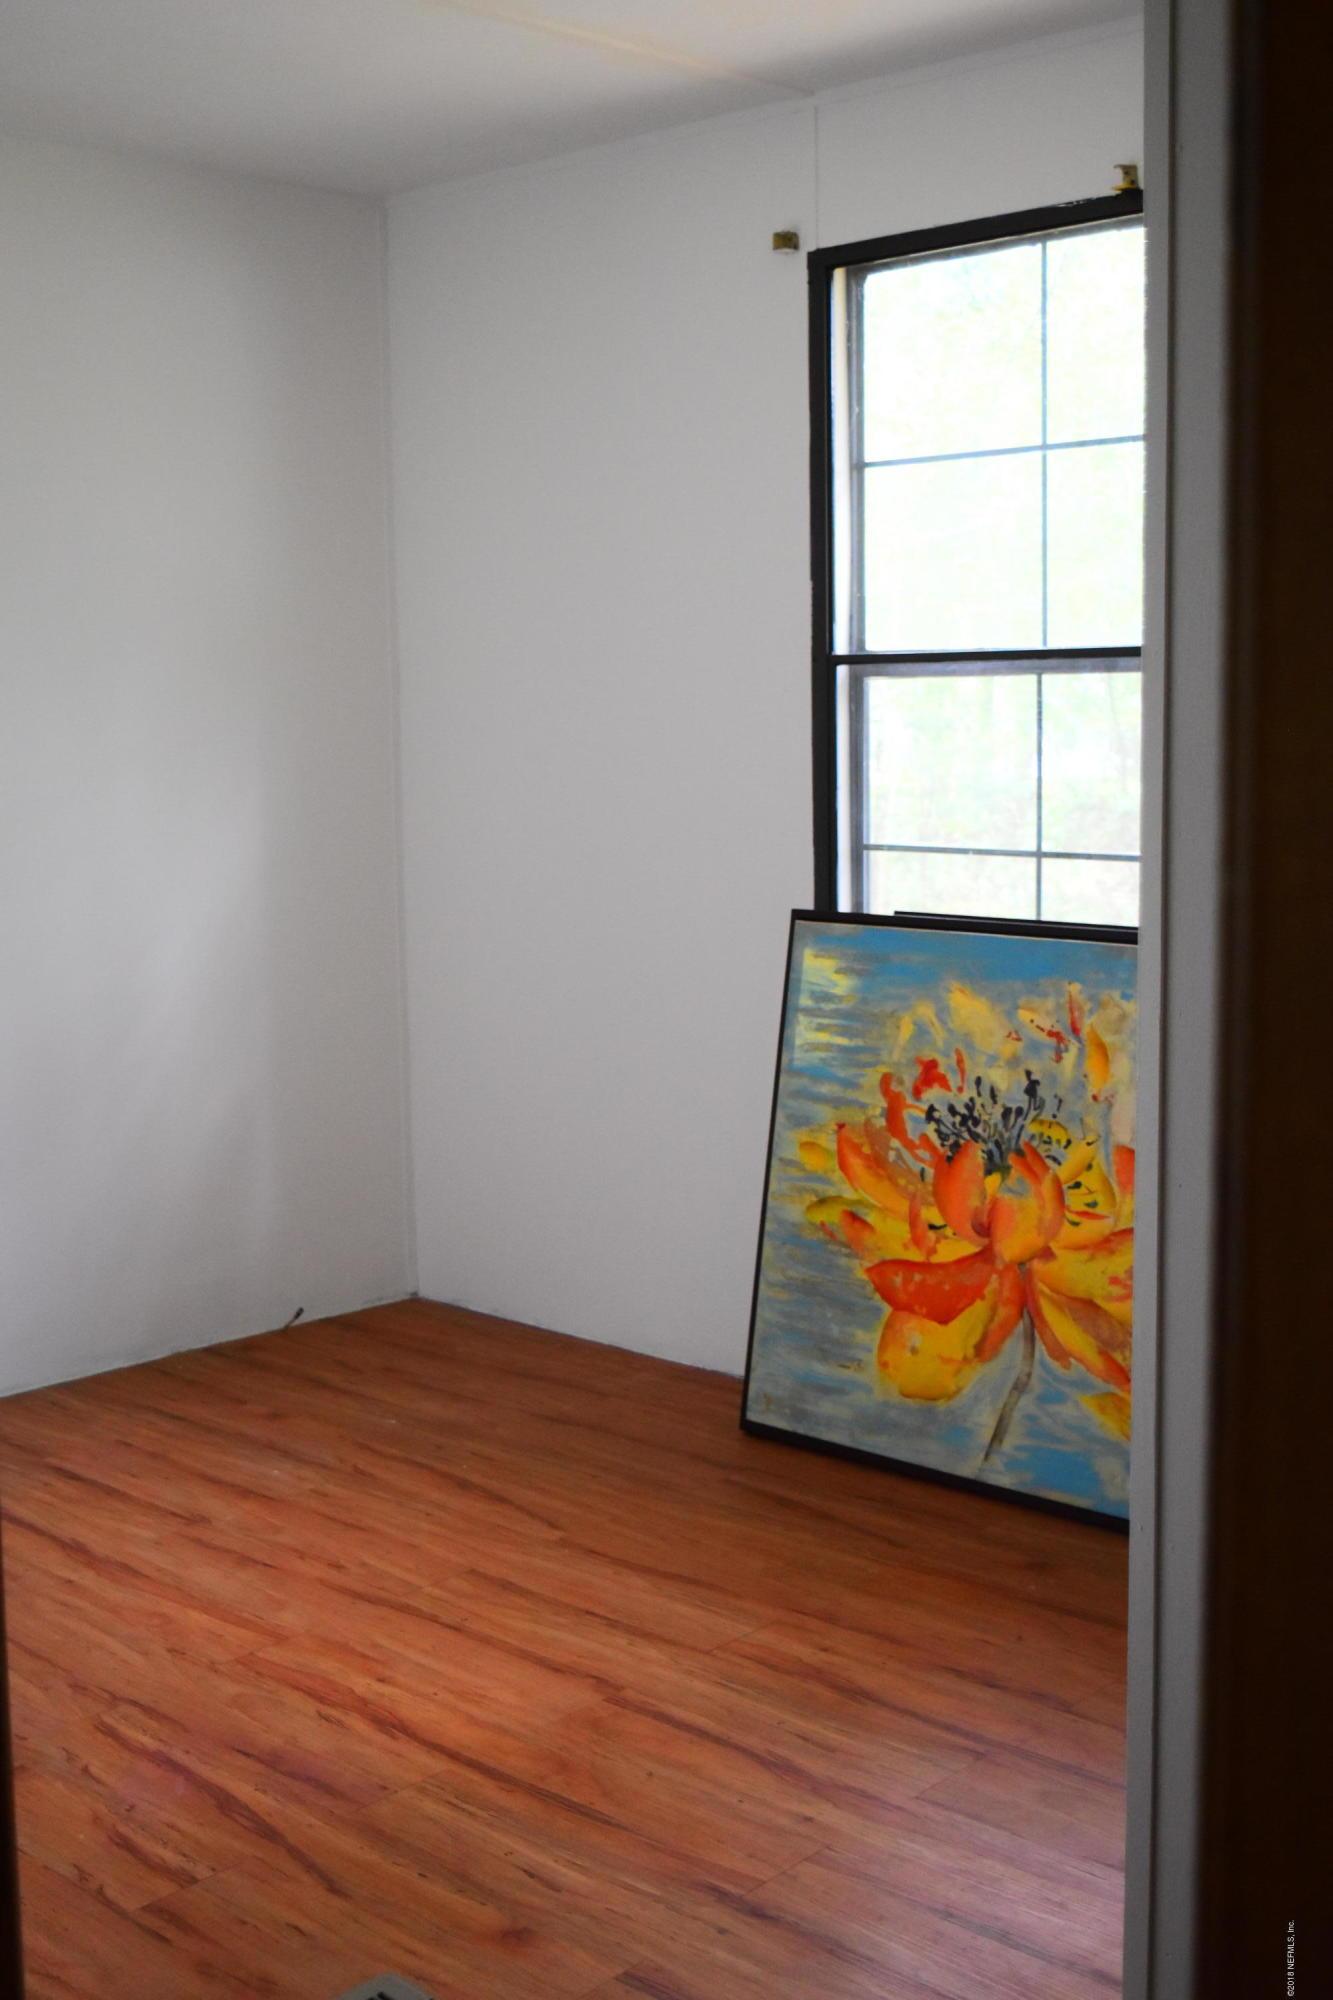 1688 BRIER, JACKSONVILLE, FLORIDA 32221, 3 Bedrooms Bedrooms, ,2 BathroomsBathrooms,Residential - mobile home,For sale,BRIER,950125